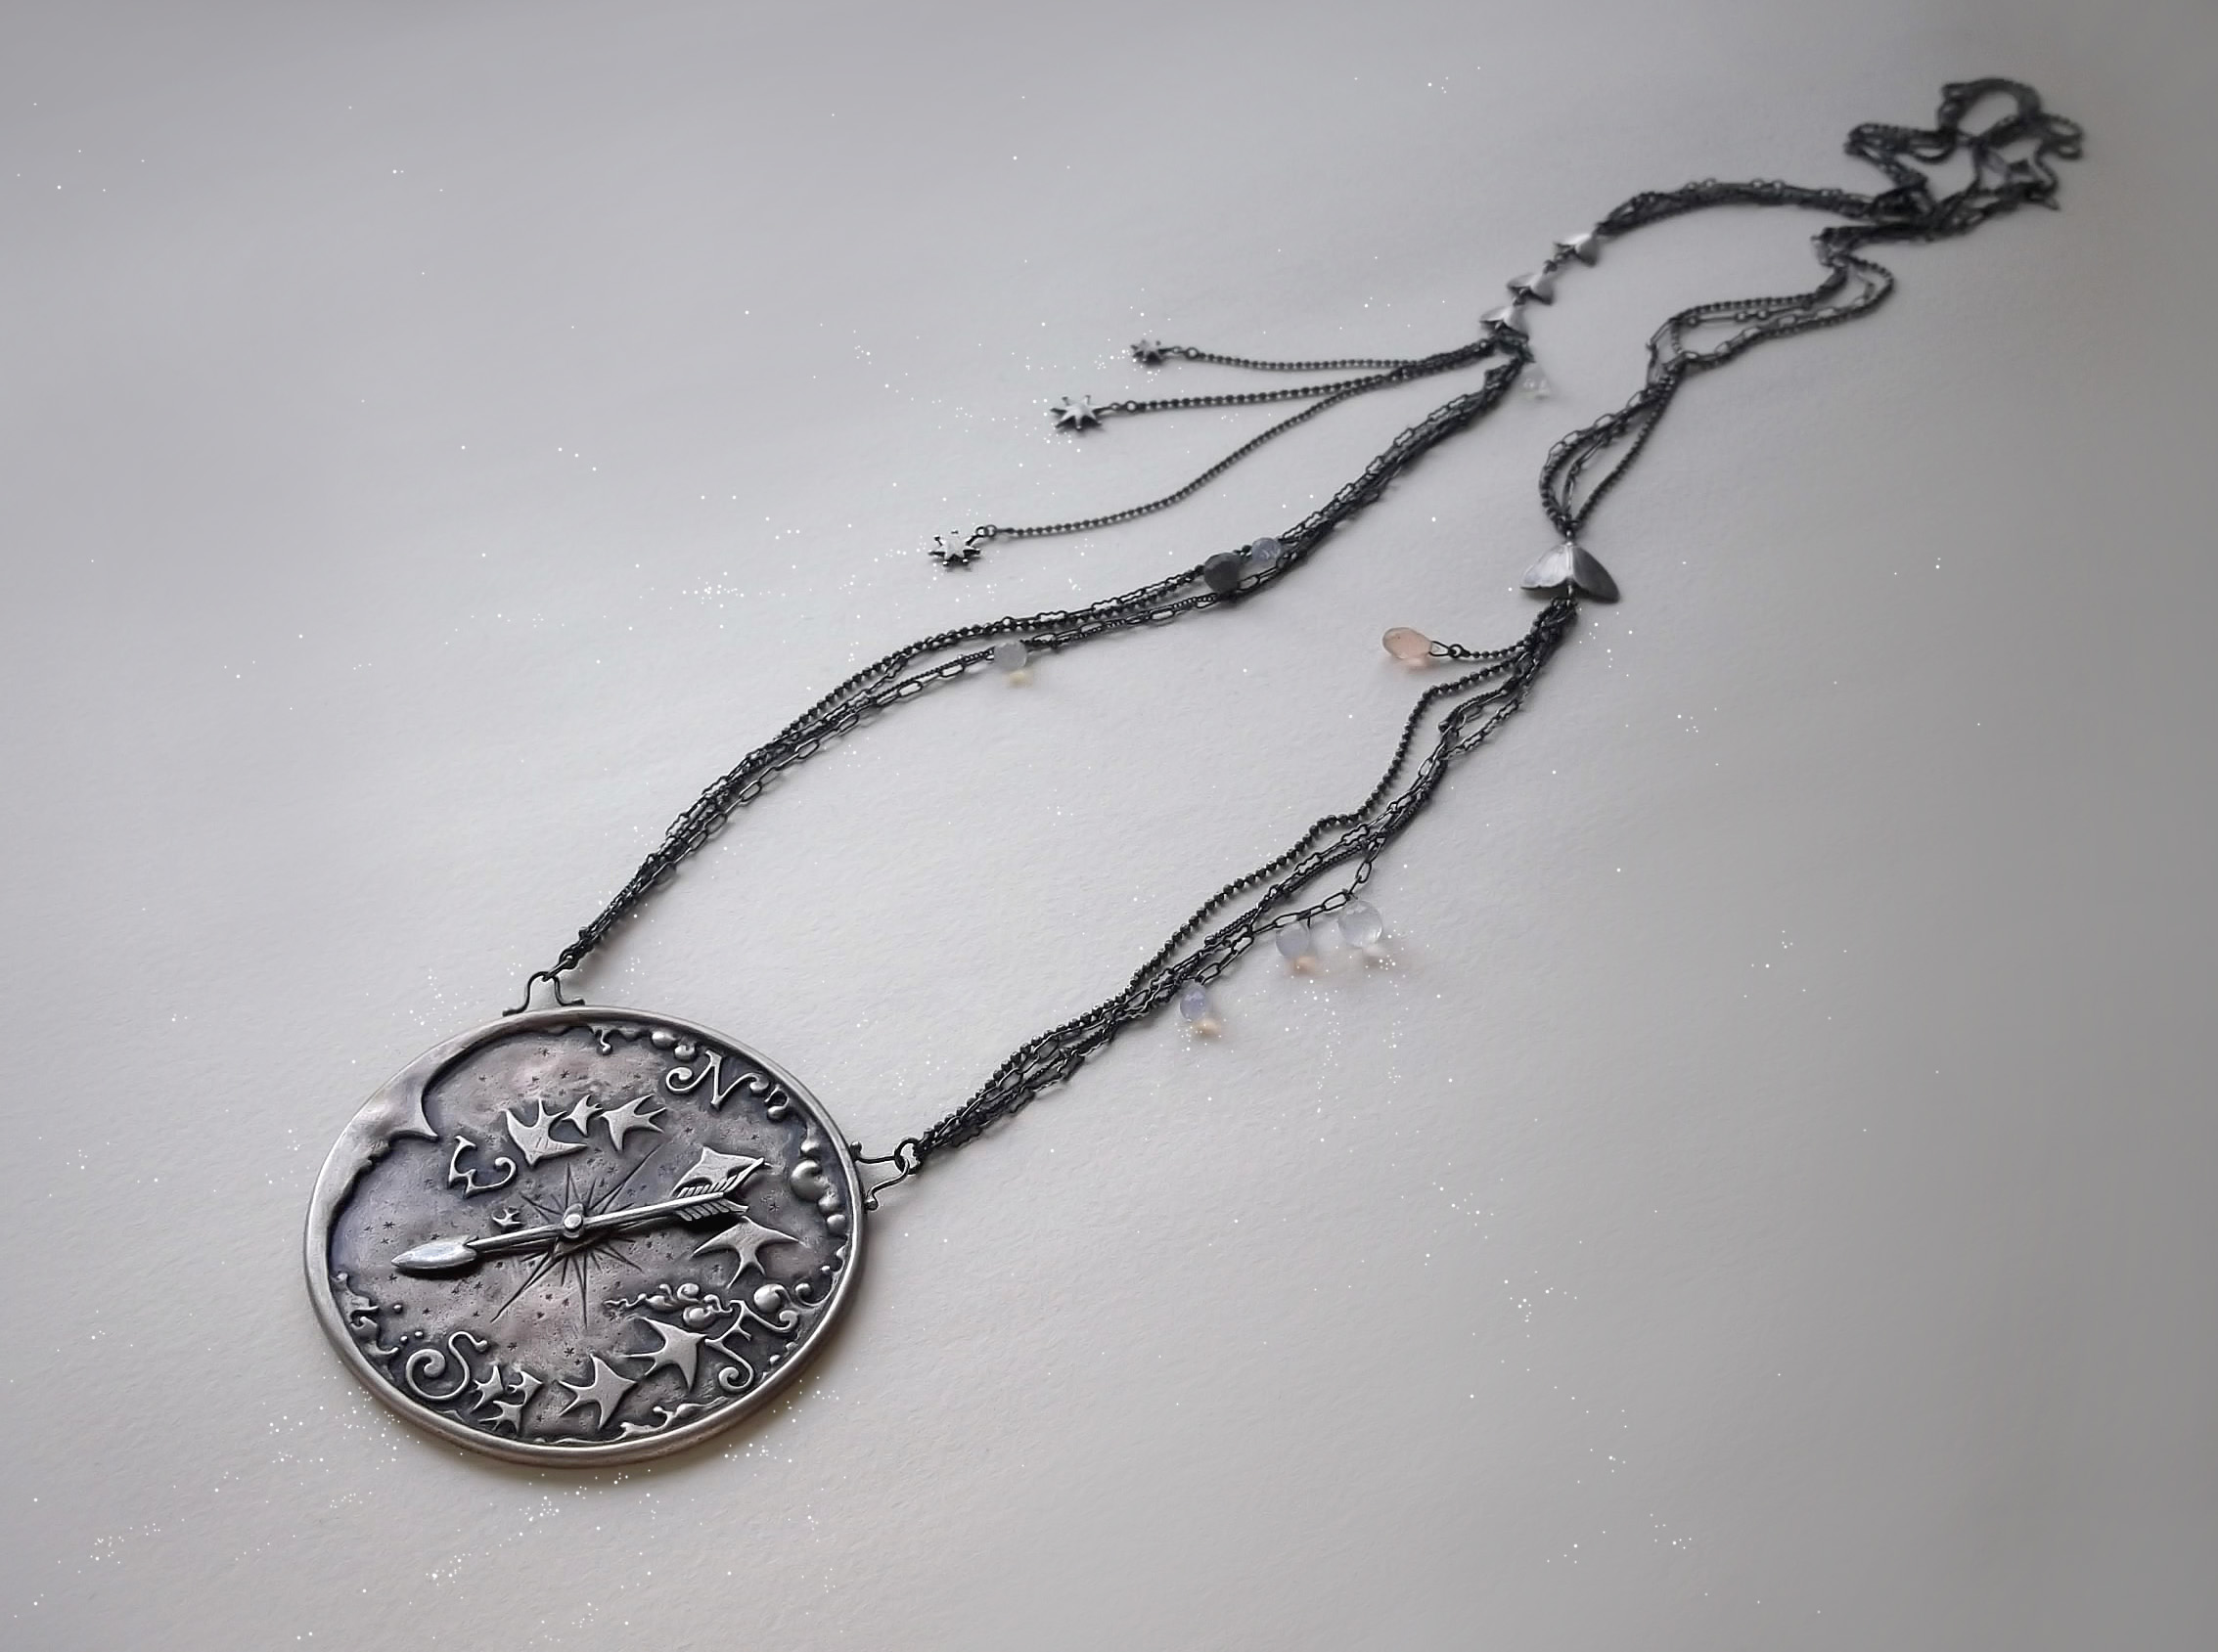 Compass Necklace detail